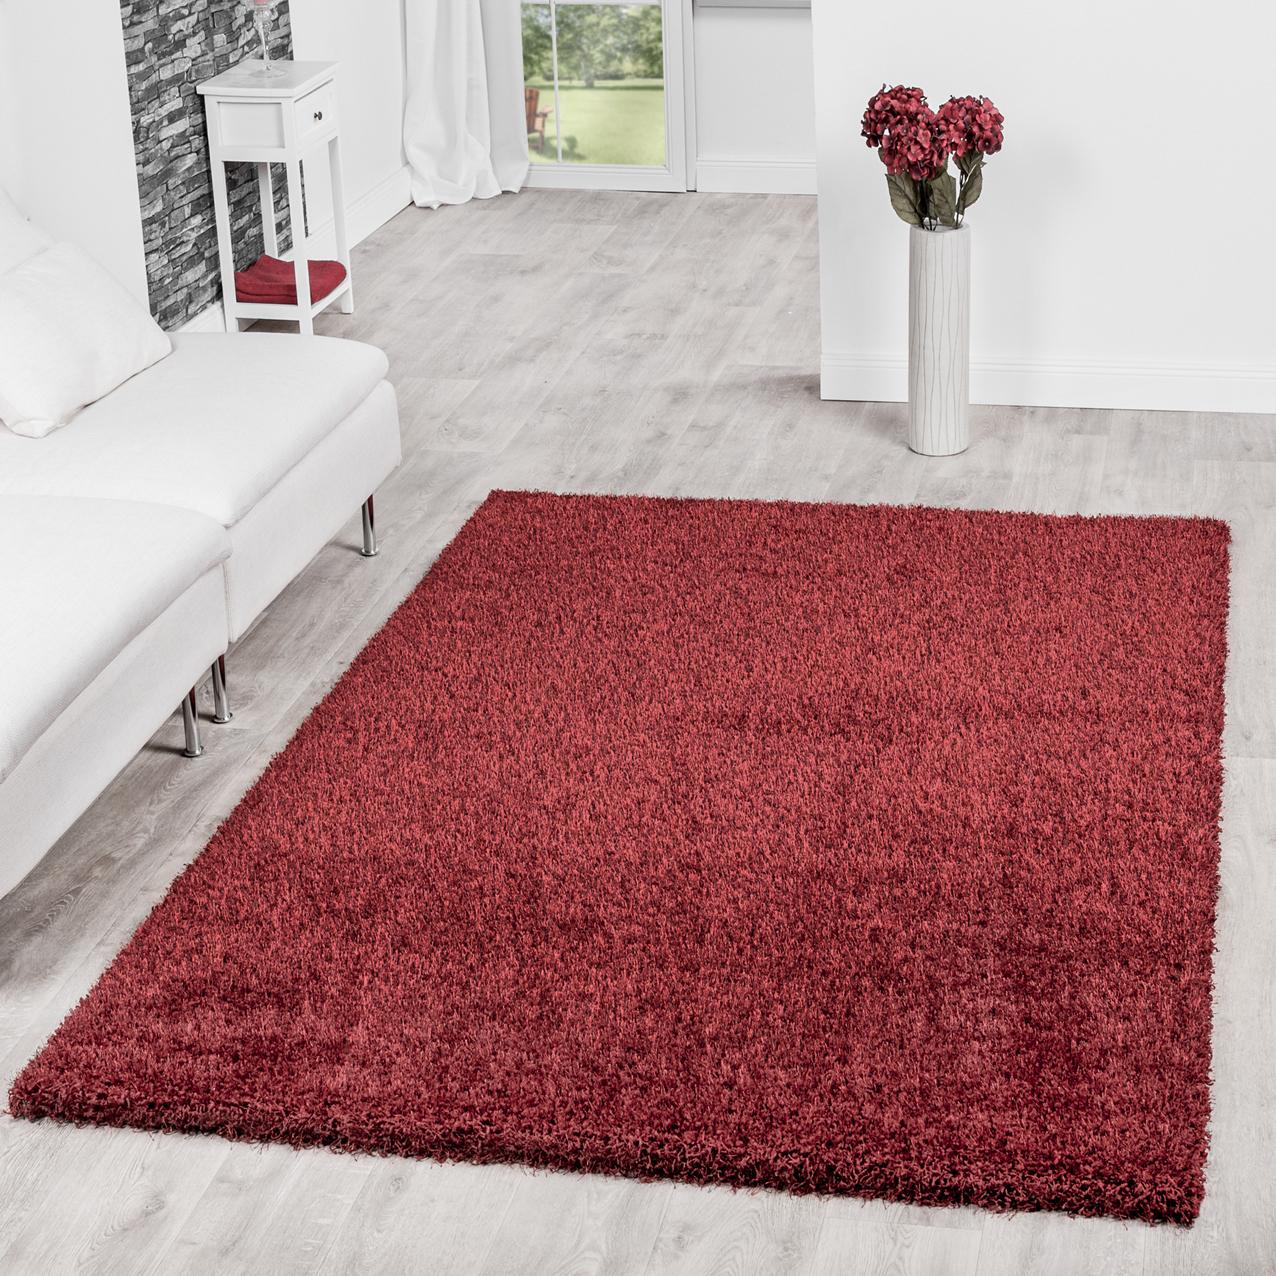 teppich shaggy hochflor teppiche langflor modern weich qualit t in rot hochflor teppich. Black Bedroom Furniture Sets. Home Design Ideas